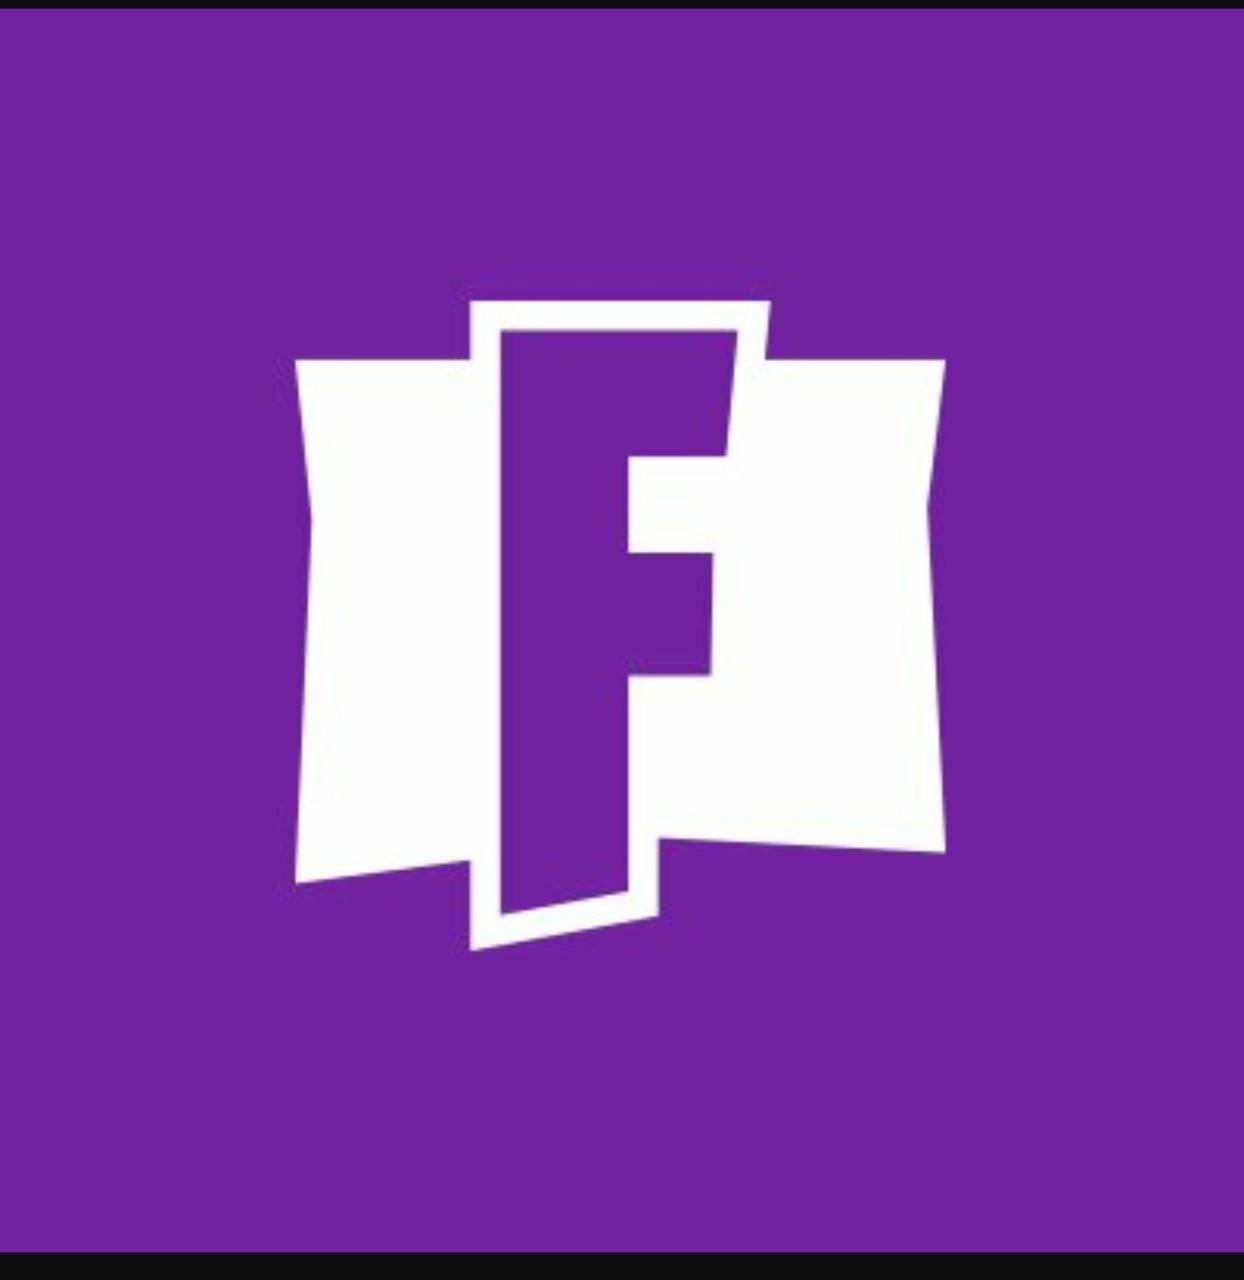 Fortnite Logo Wallpaper By Foxy1092 Da Free On Zedge